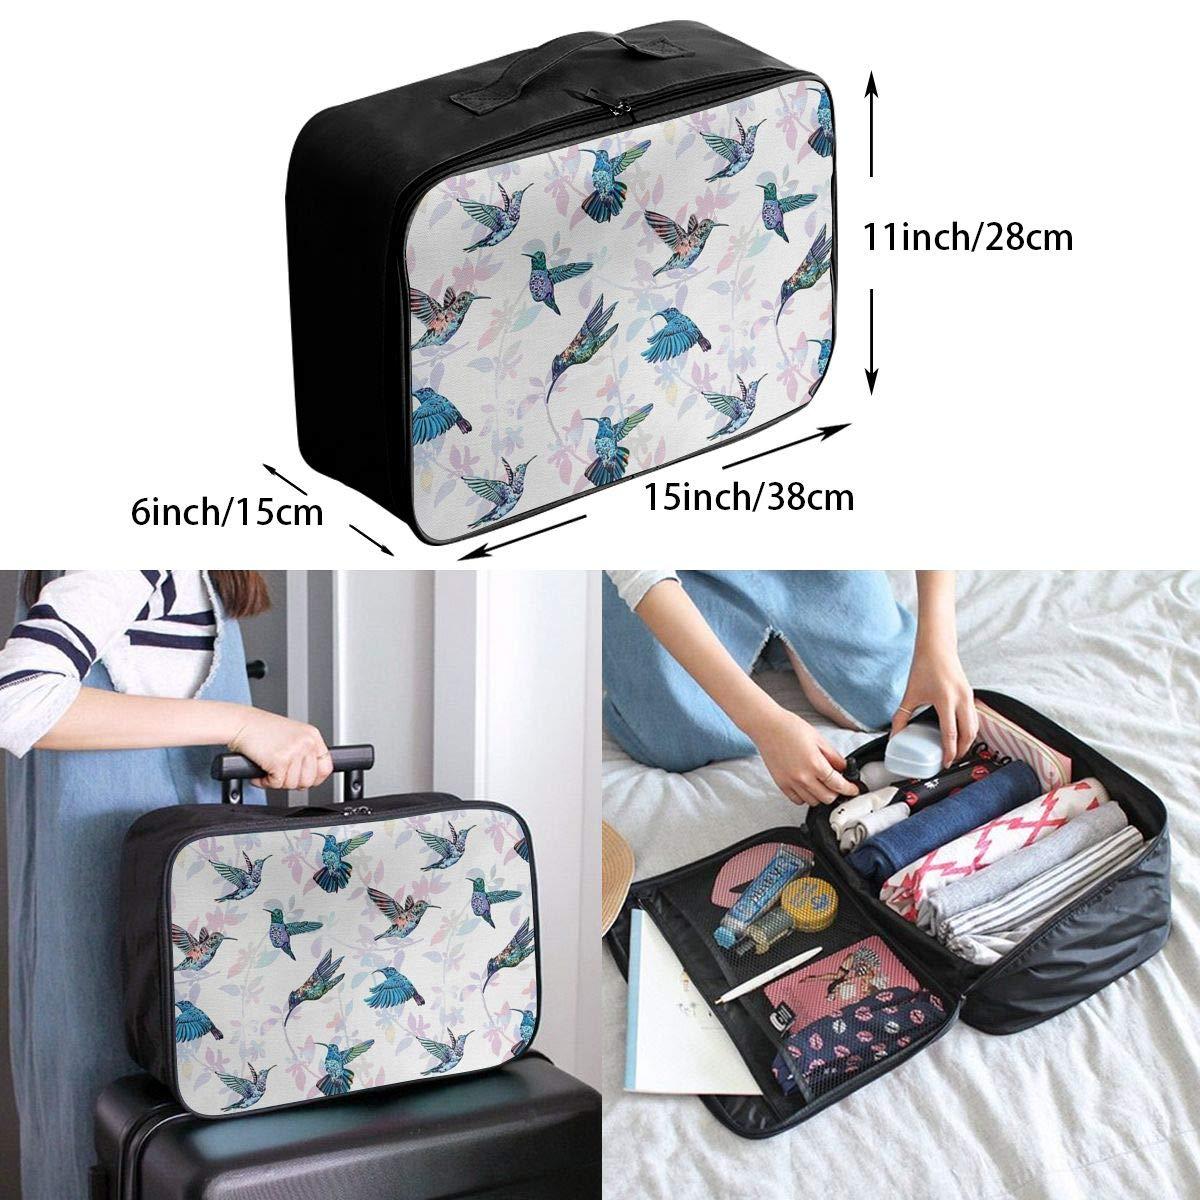 ADGAI Wildlife Inspirations Exotic Flying Creatures Canvas Travel Weekender Bag,Fashion Custom Lightweight Large Capacity Portable Luggage Bag,Suitcase Trolley Bag